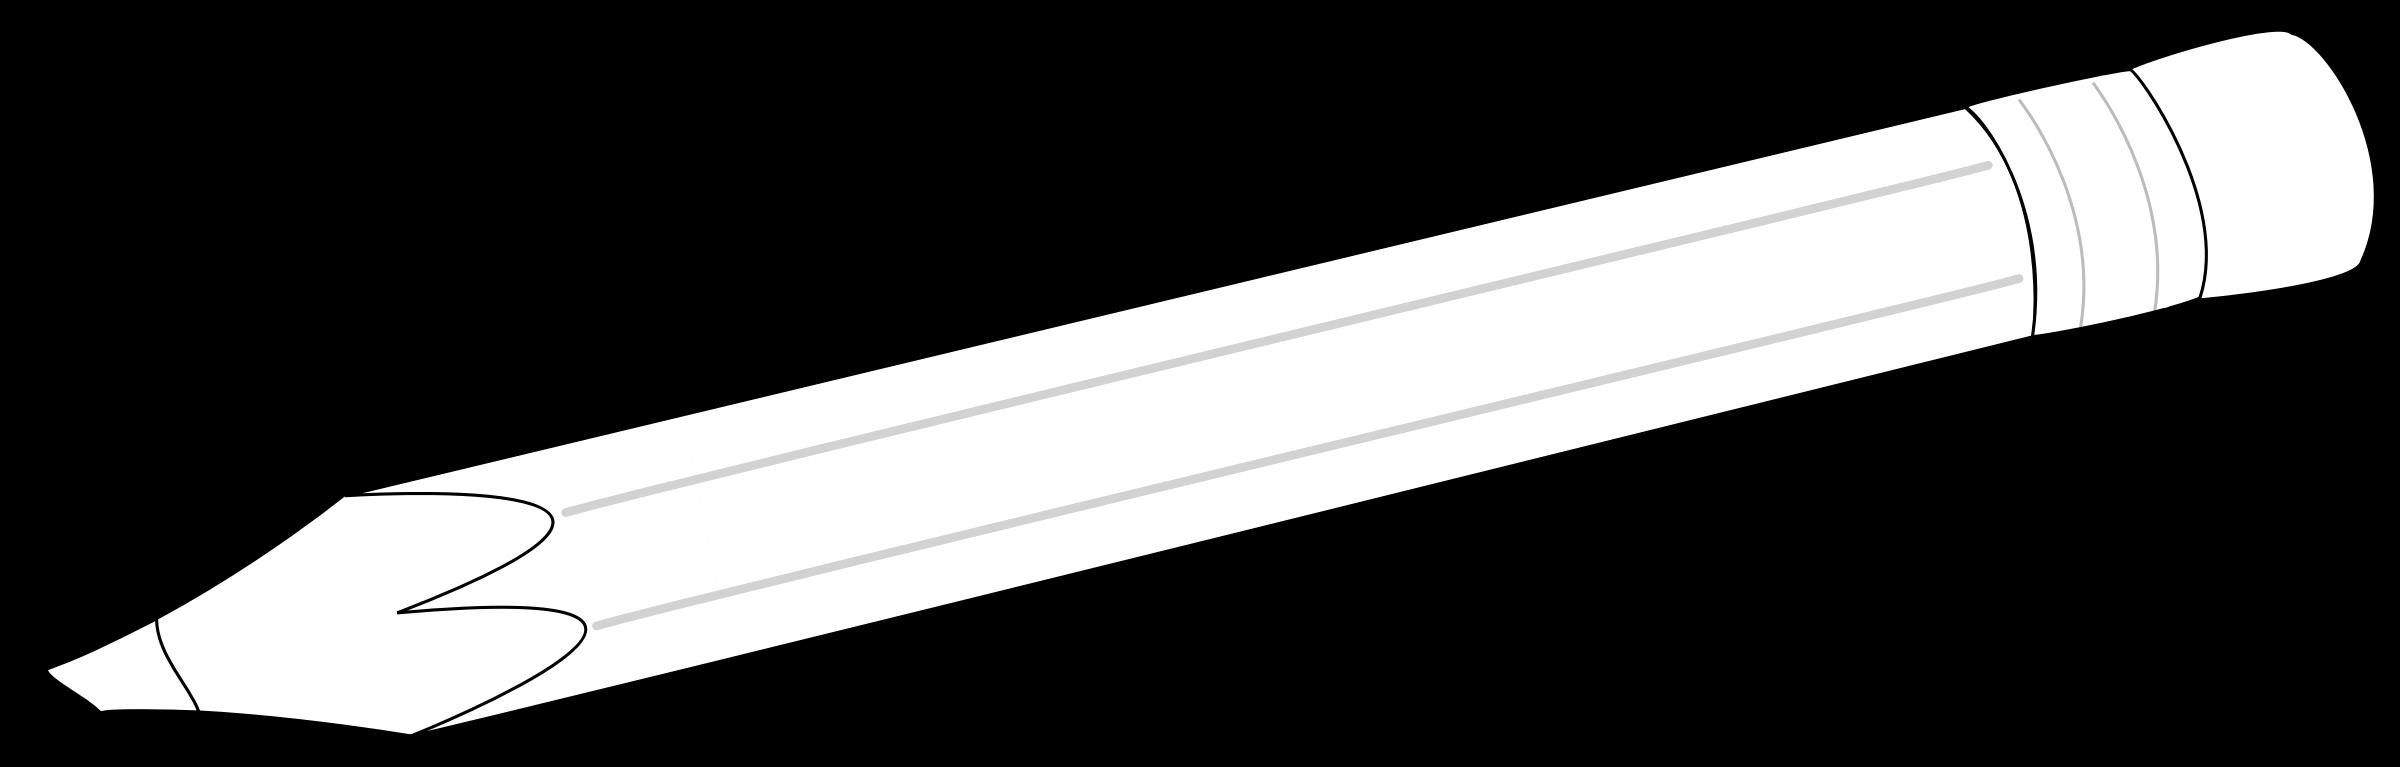 2400x767 Clipart